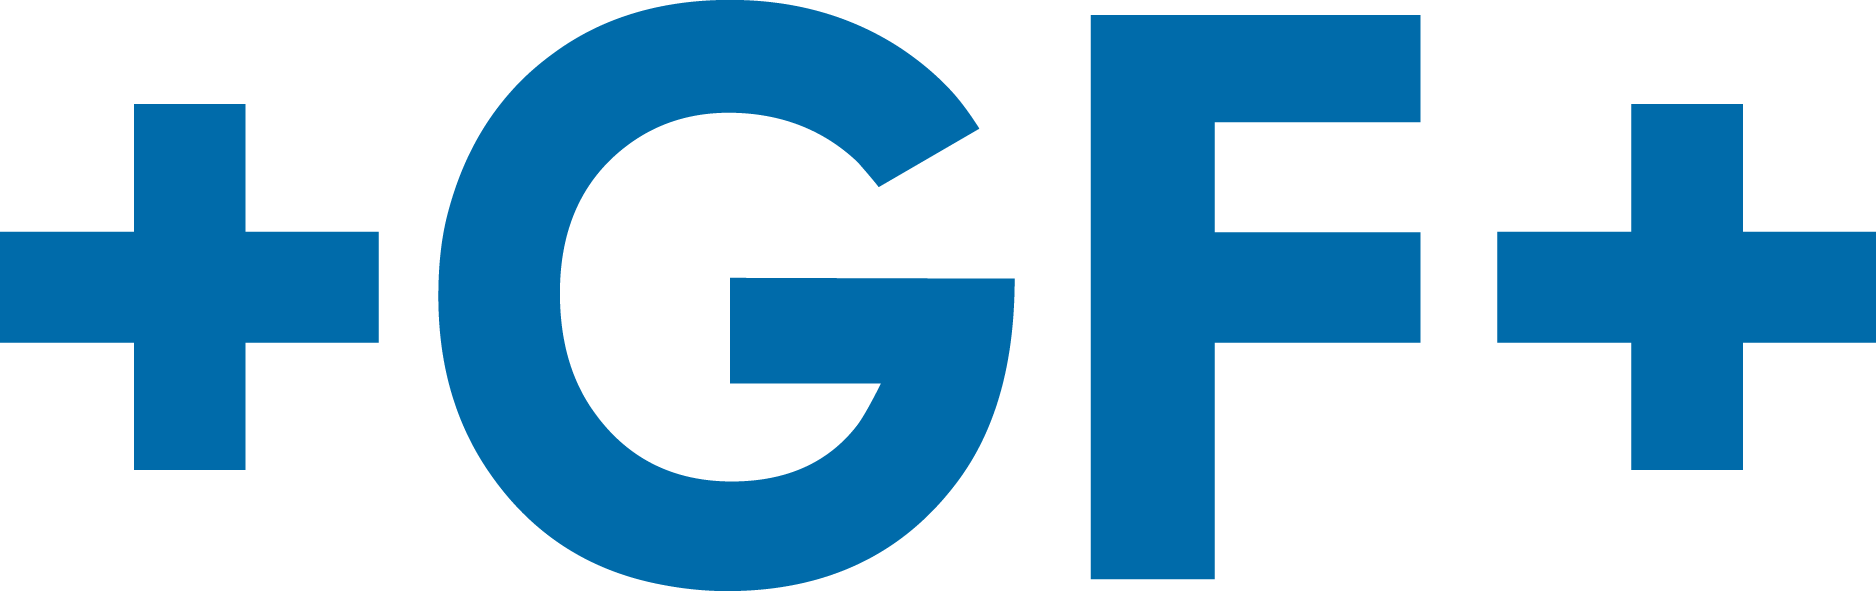 GF Machining Solutions International SA - Nederland